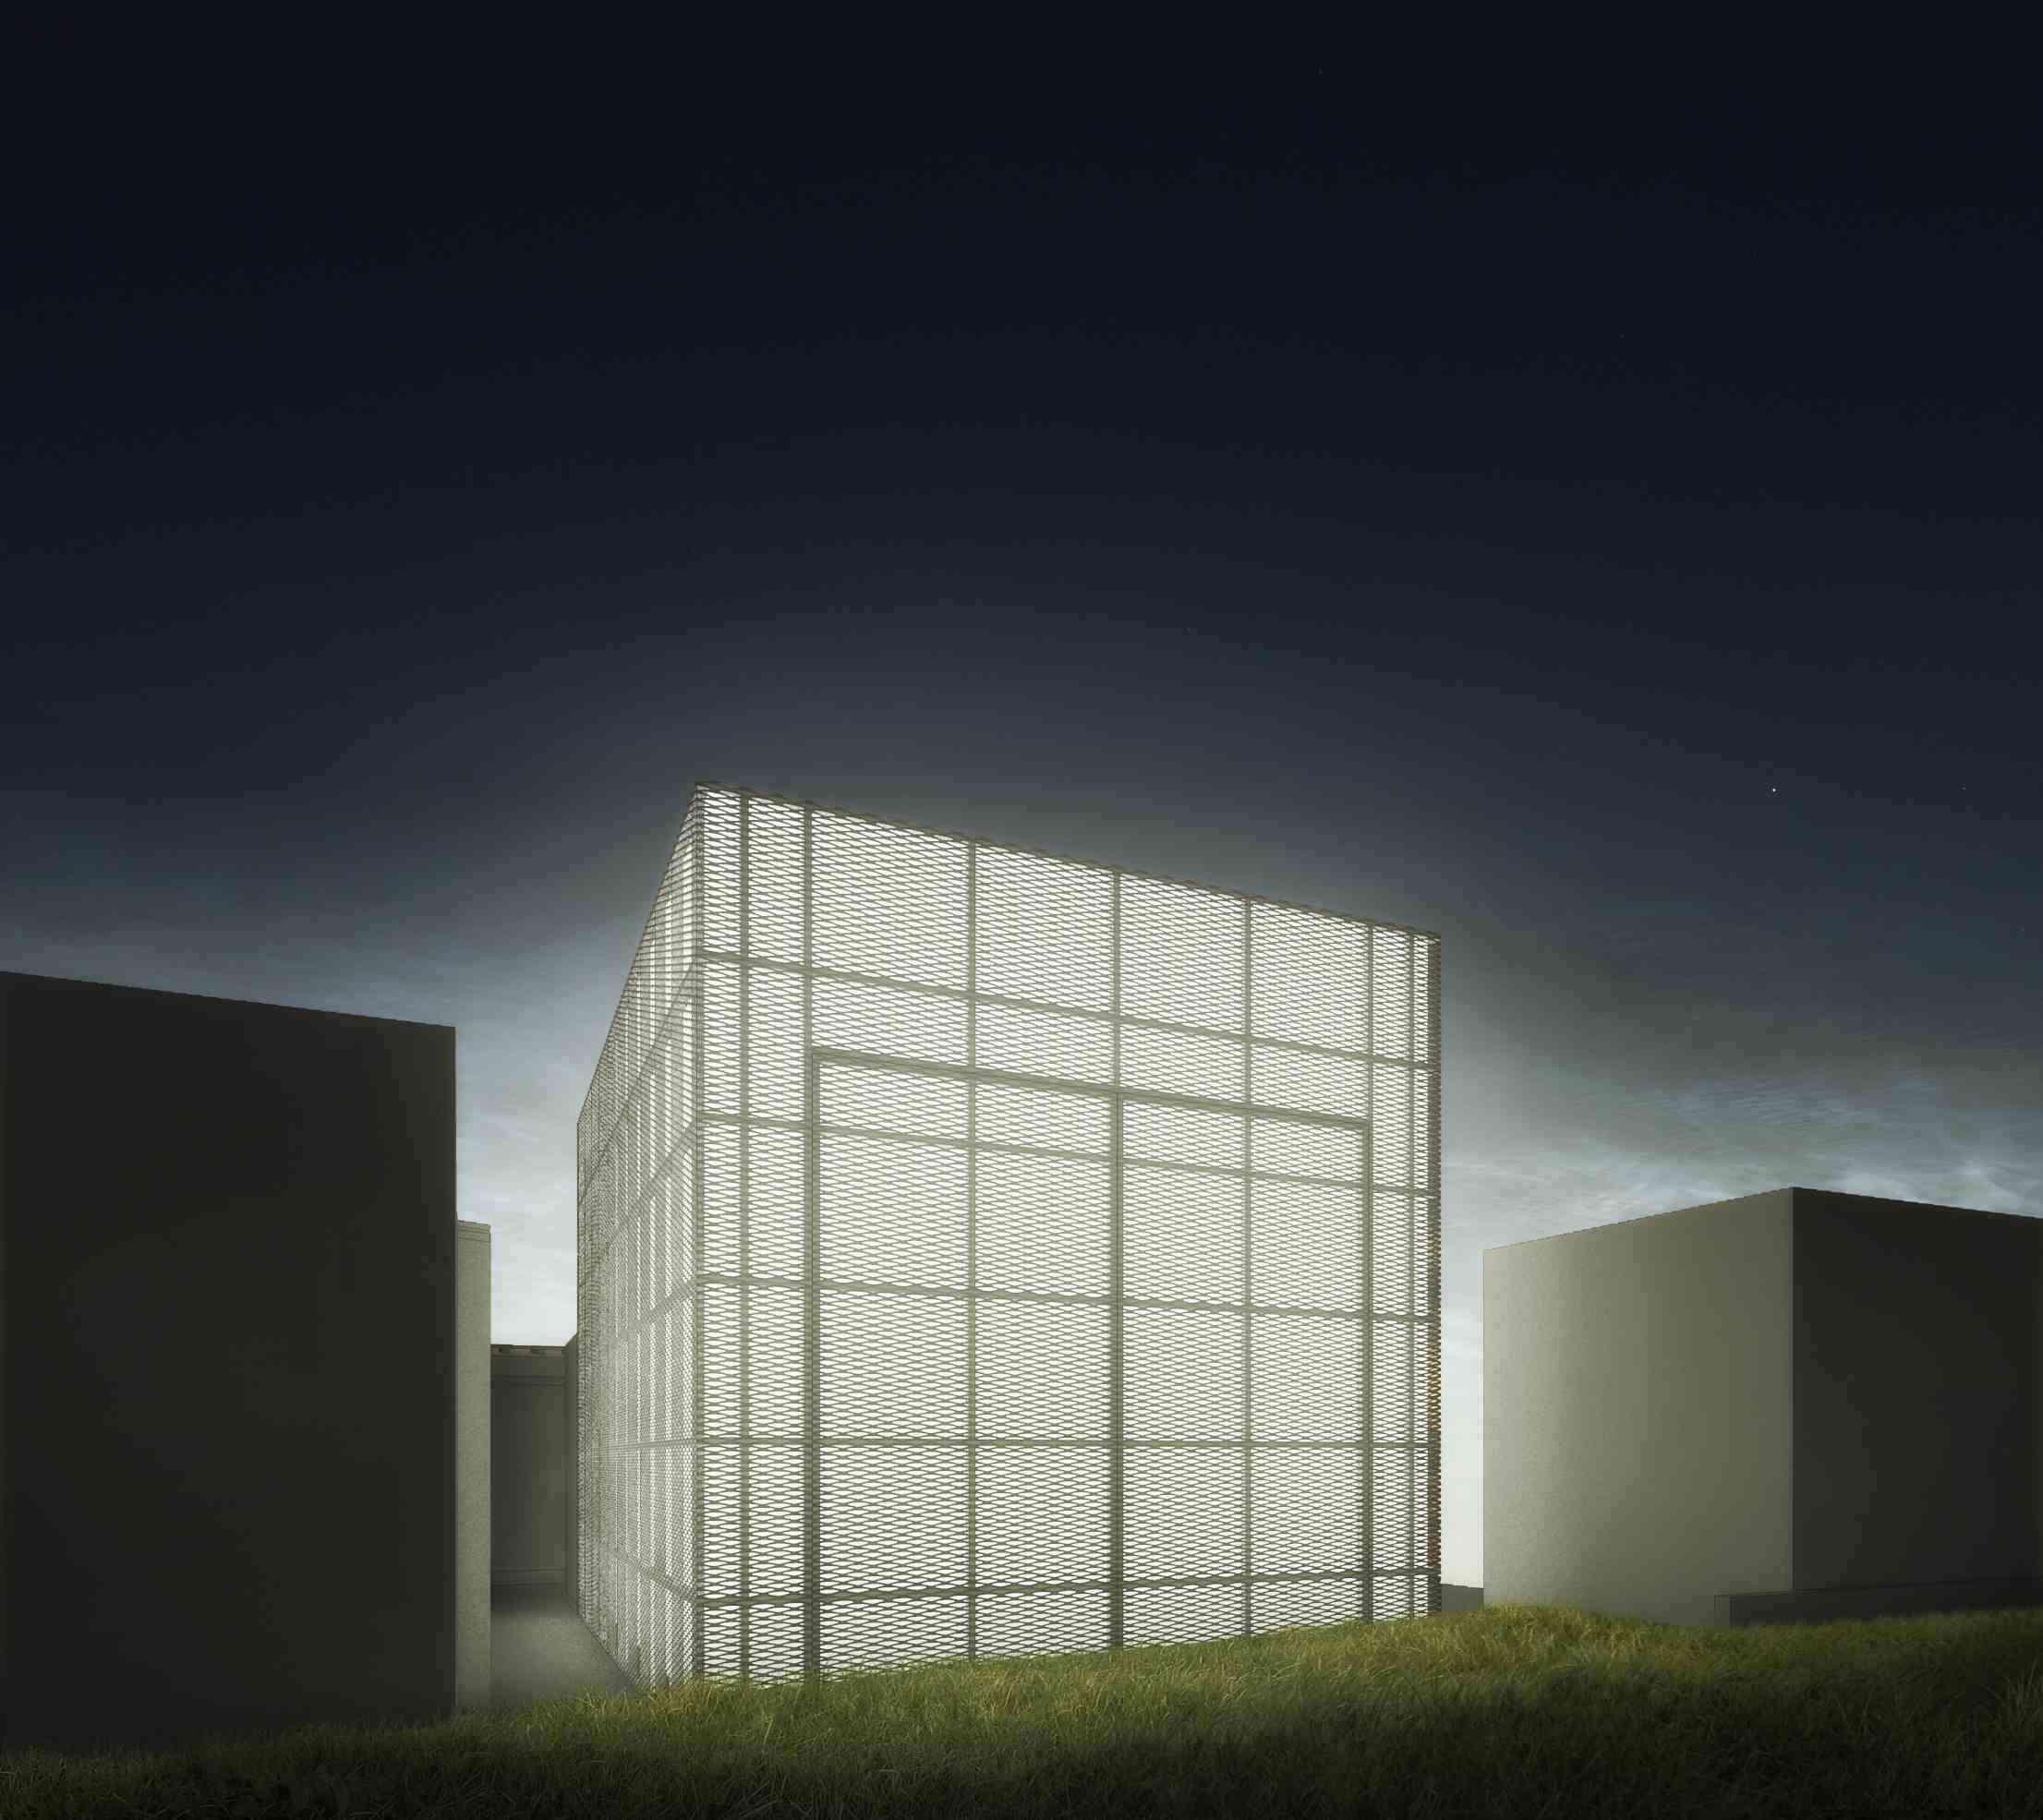 Imagem: Teatro Multiuso/Perspectiva Externa por Haiko Cirne Sinnema